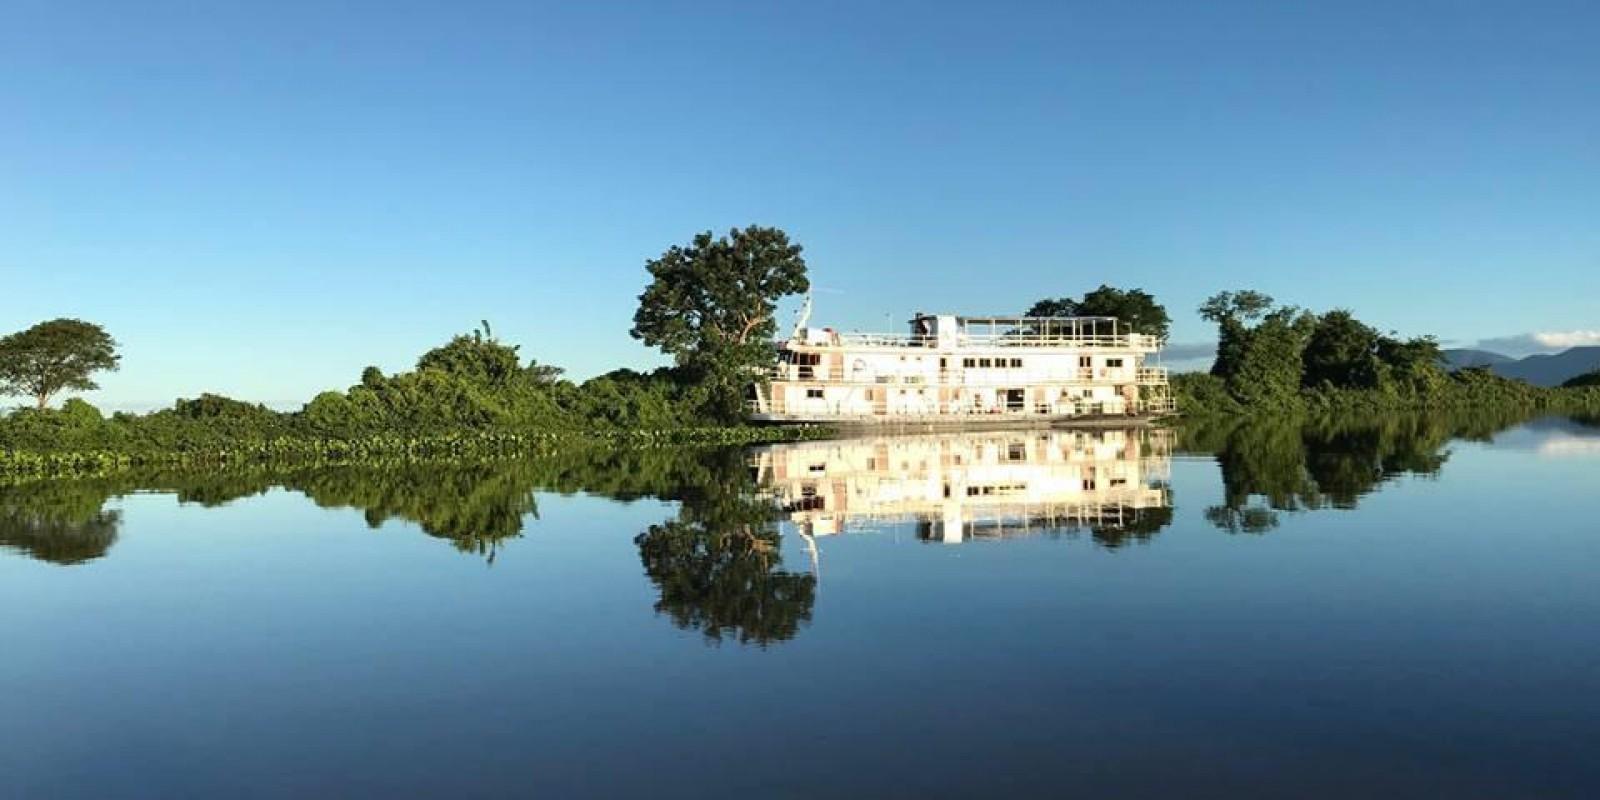 Barco Hotel Paola II - Corumbá - 20 pessoas  - Foto 7 de 16